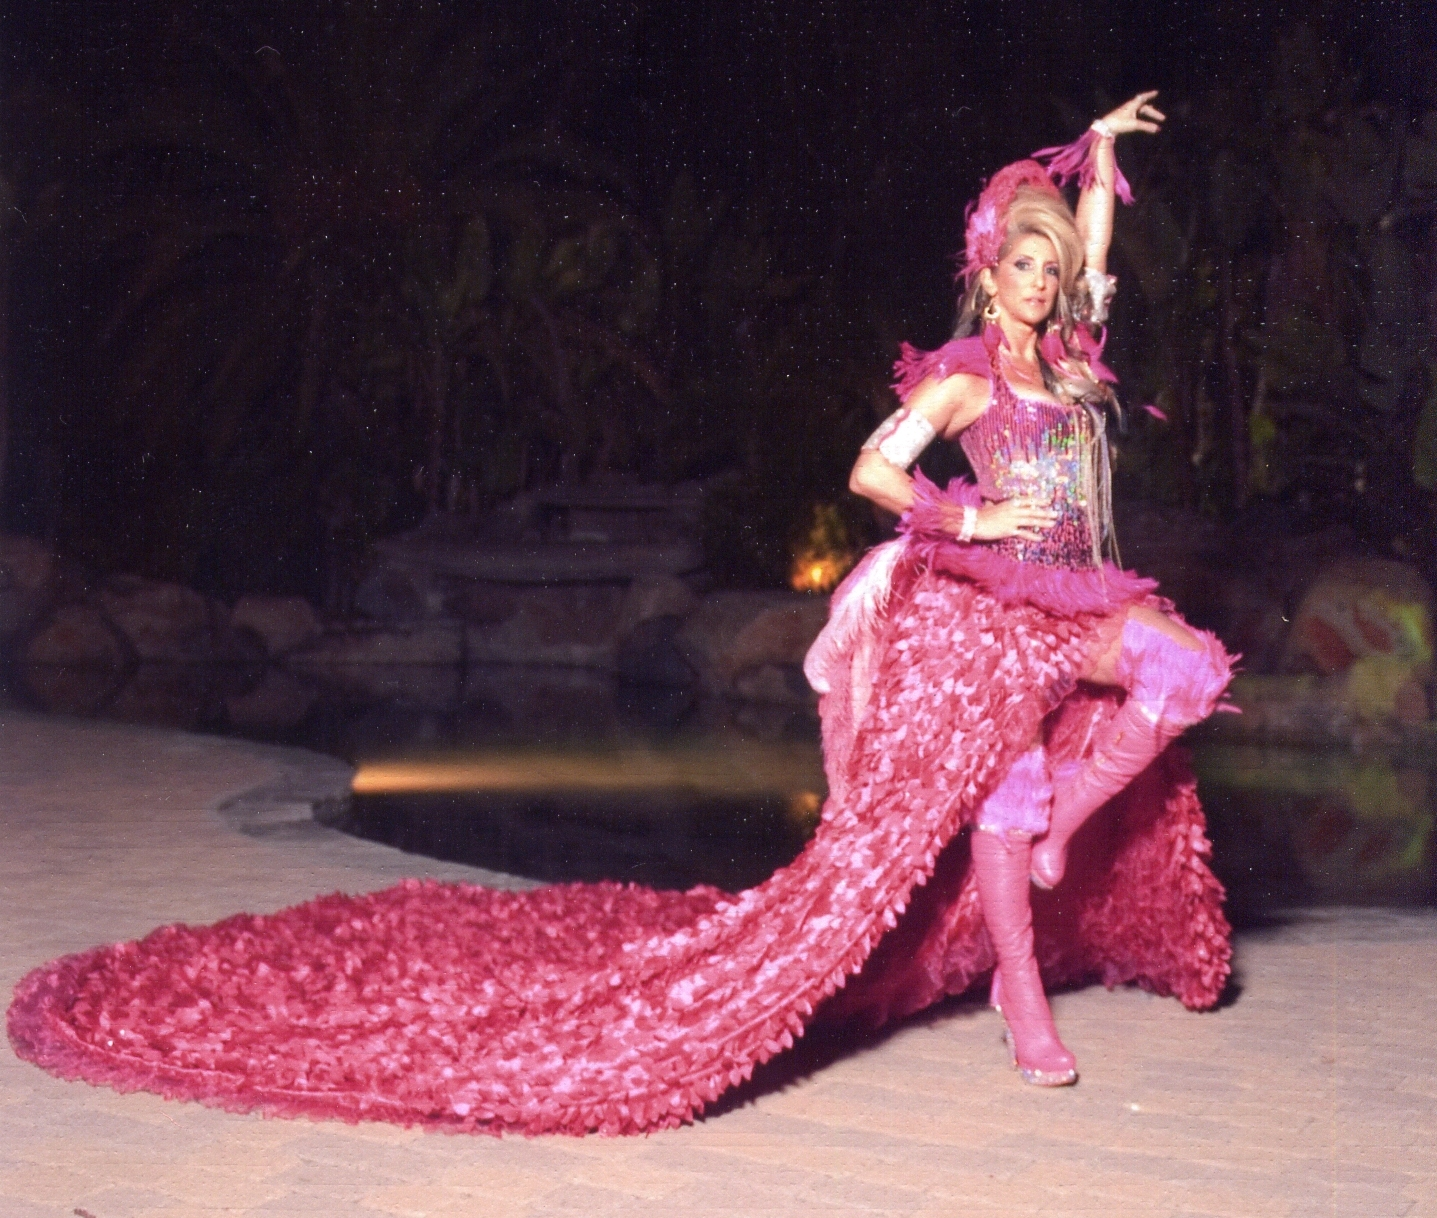 Deni Jacobs in Flamingo costume